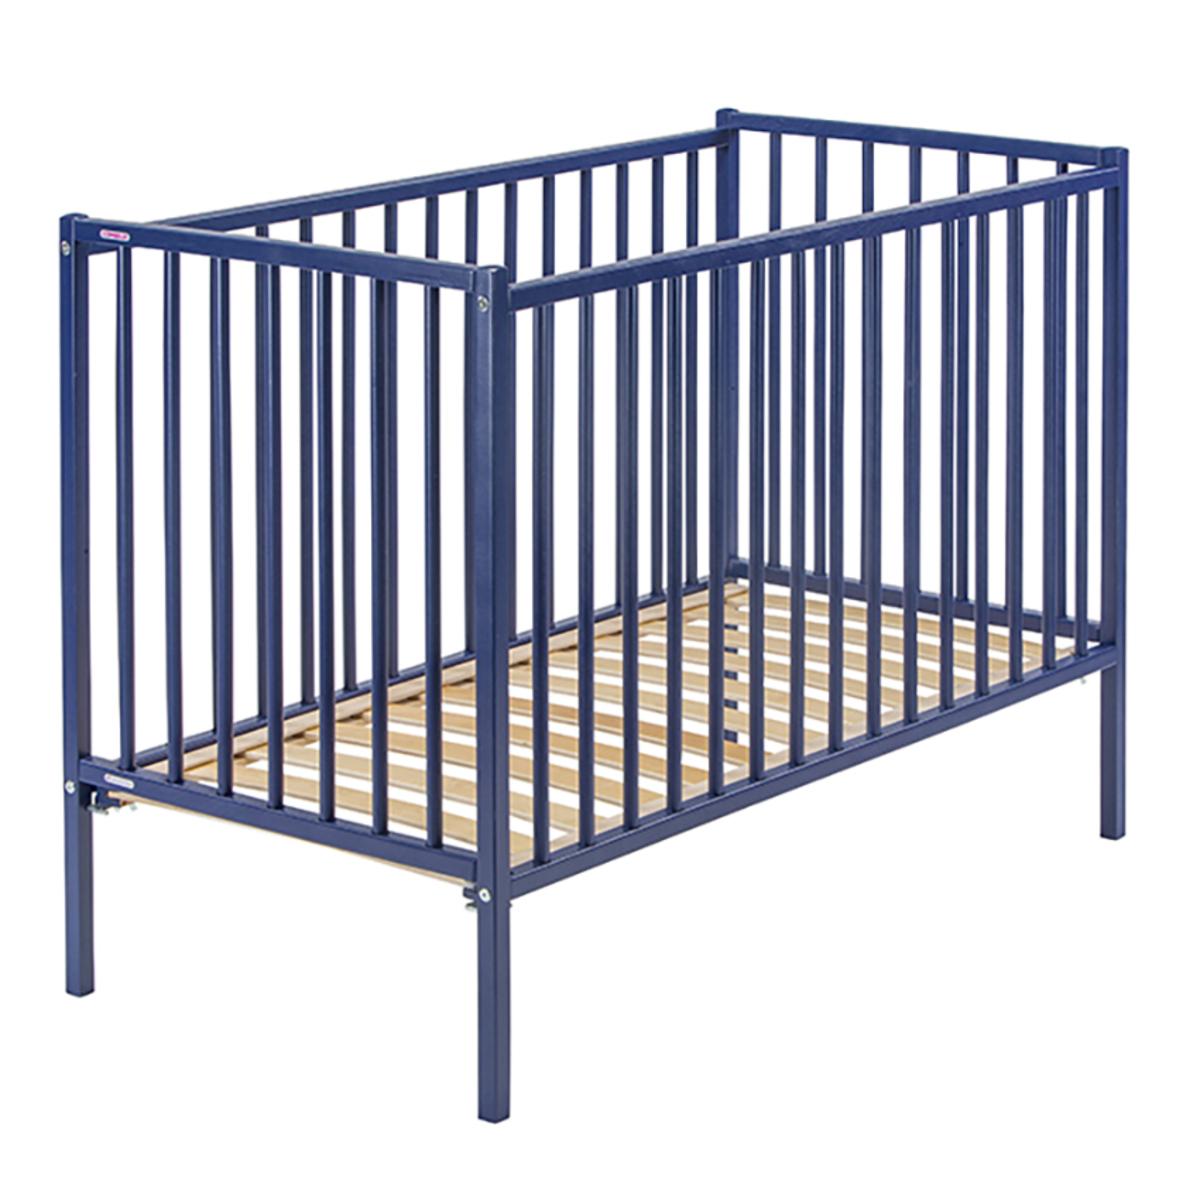 Lit bébé Lit Bébé Rémi Bleu - 70 x 140 cm Lit Bébé Rémi Bleu - 70 x 140 cm